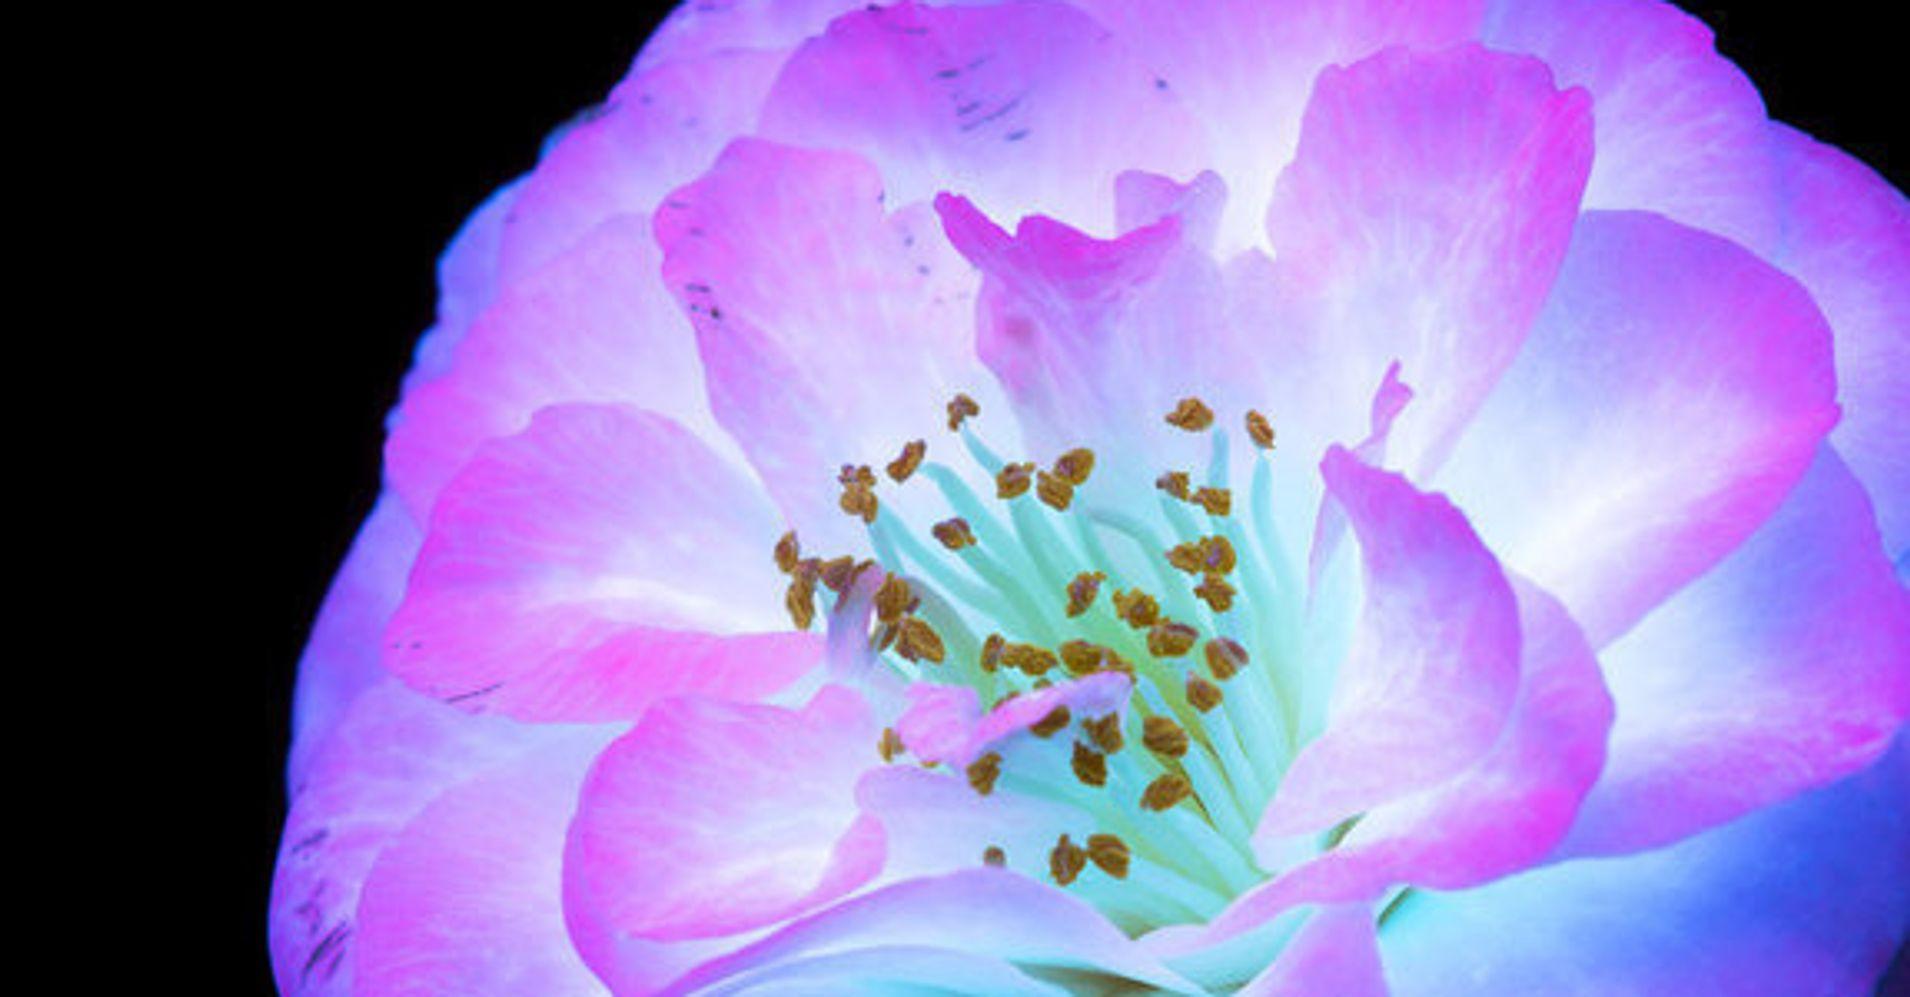 Amazing photos capture how flowers look under ultraviolet light amazing photos capture how flowers look under ultraviolet light huffpost izmirmasajfo